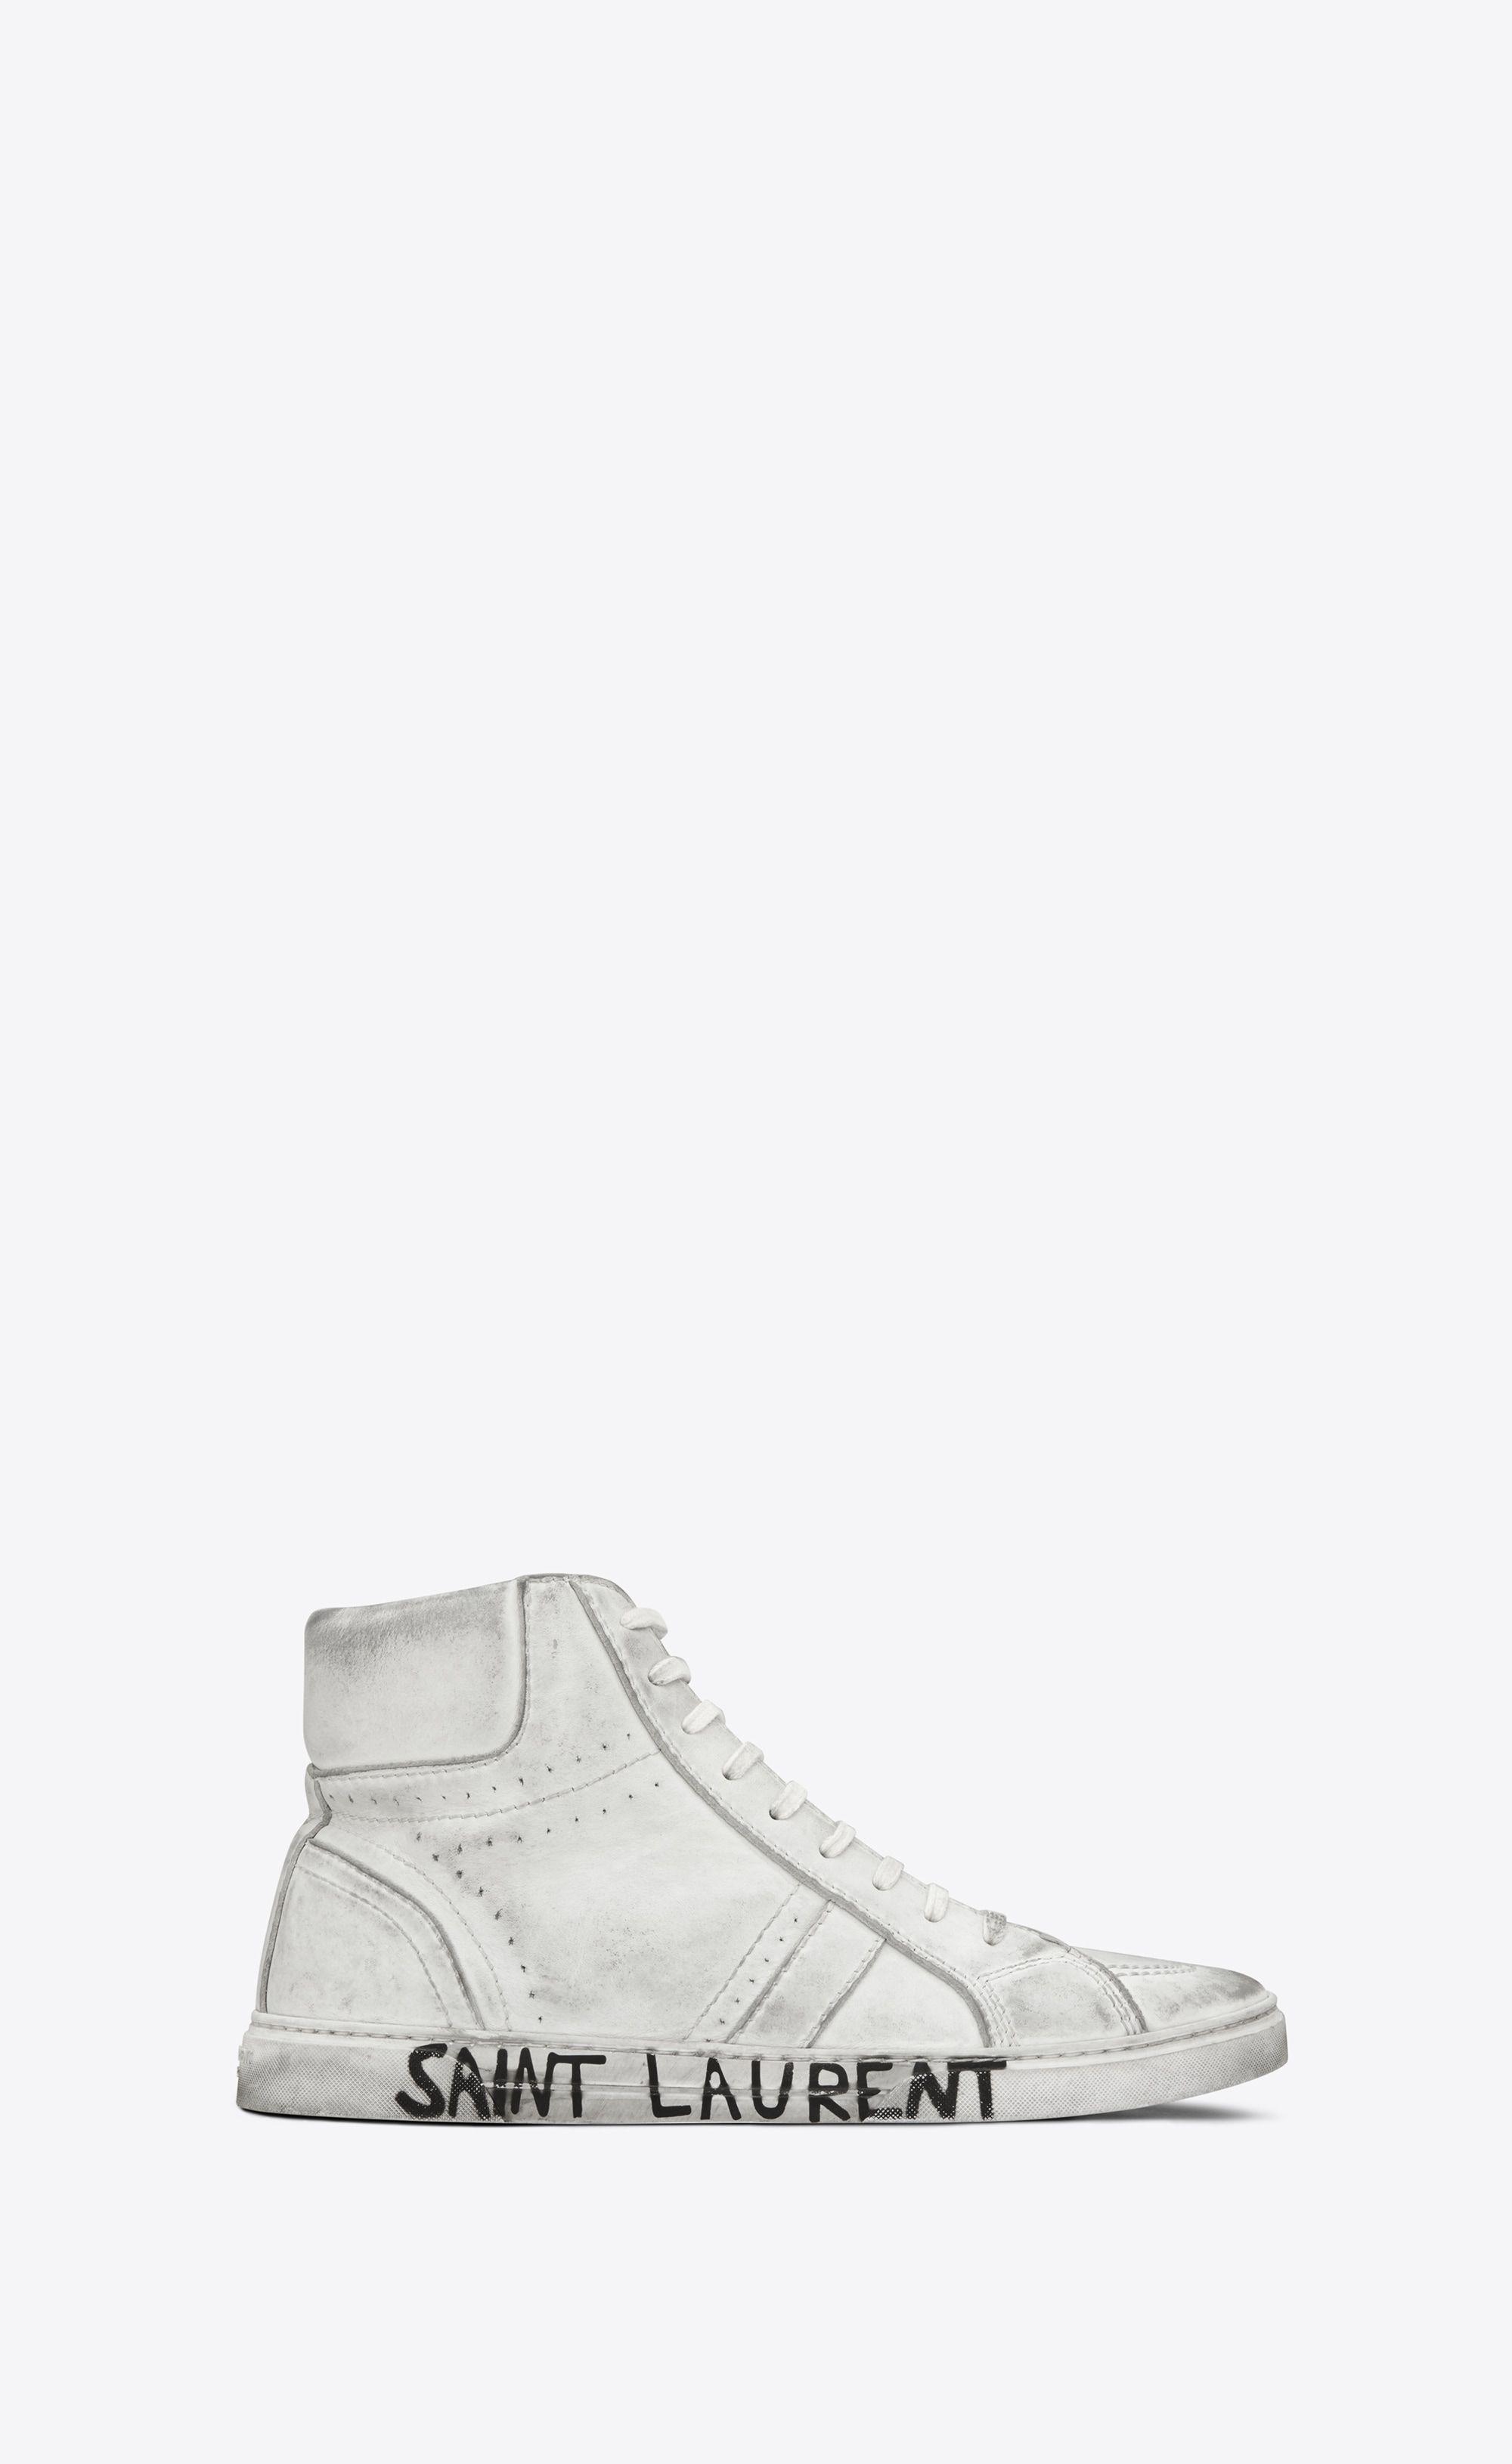 226d0587dc Joe sneakers in worn-look leather | Actual Wardrobe Material ...